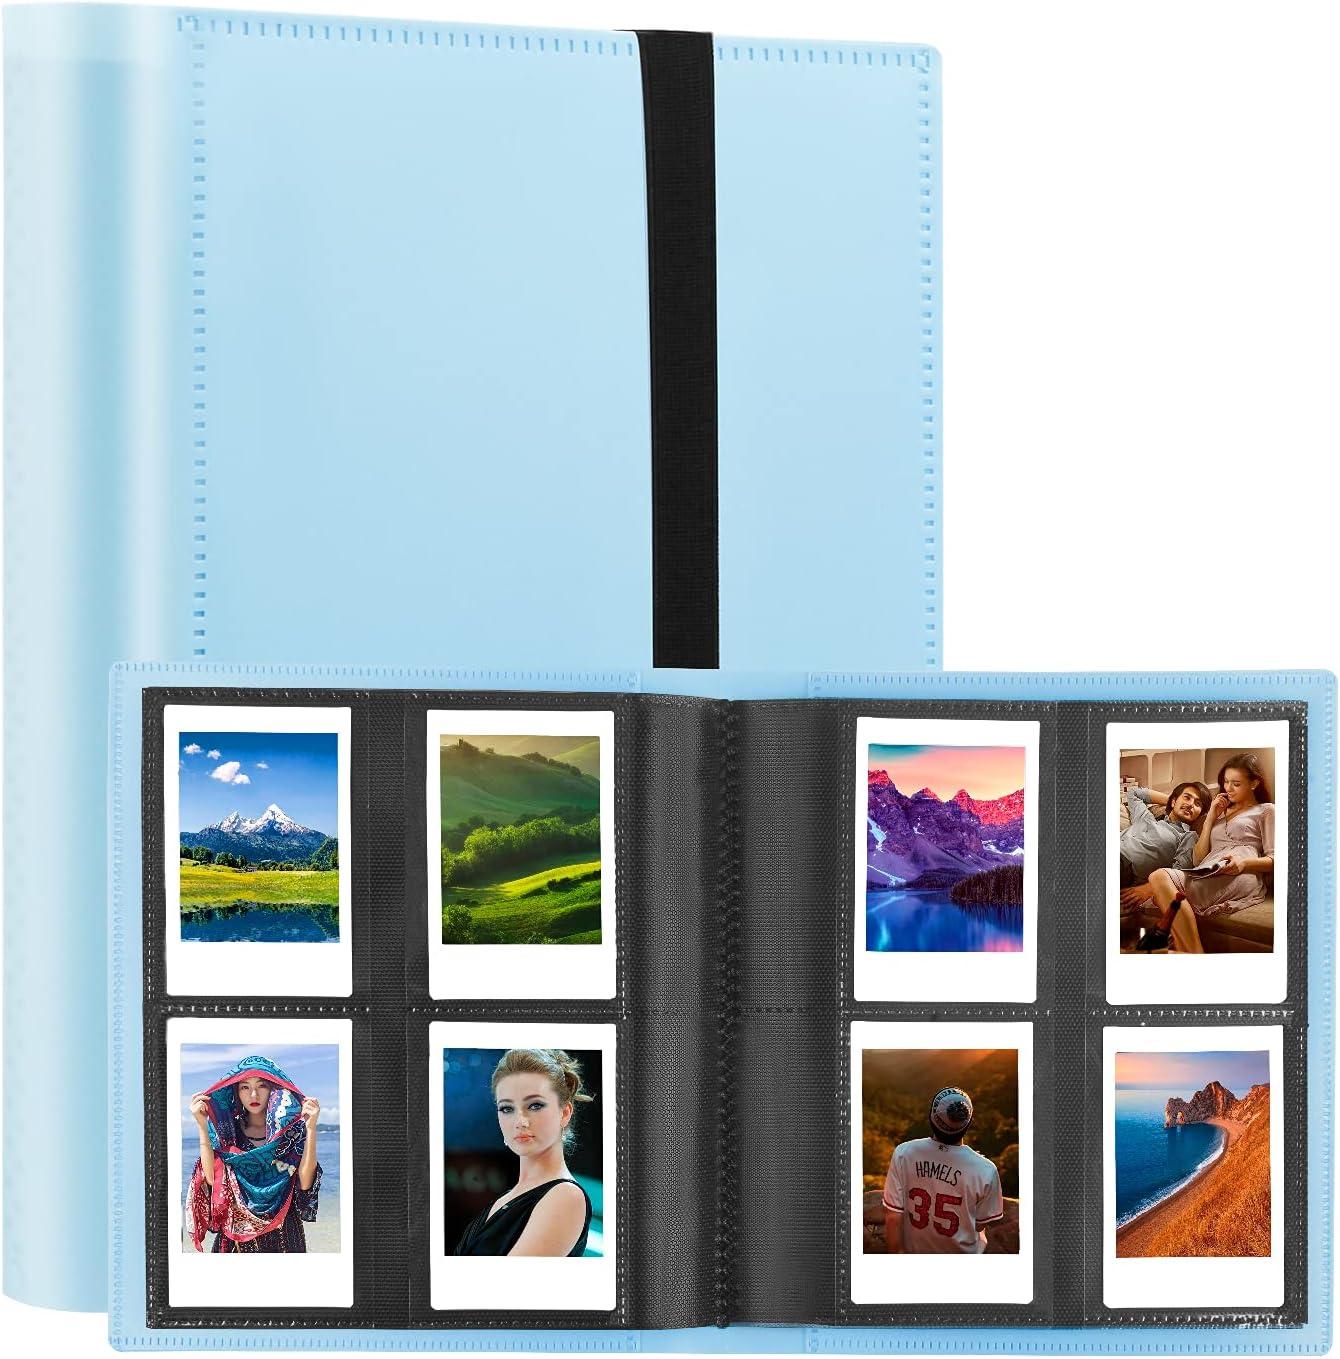 192 Pockets Album for Fujifilm Instax Inst Polaroid Mini Camera Selling rankings Sale Special Price